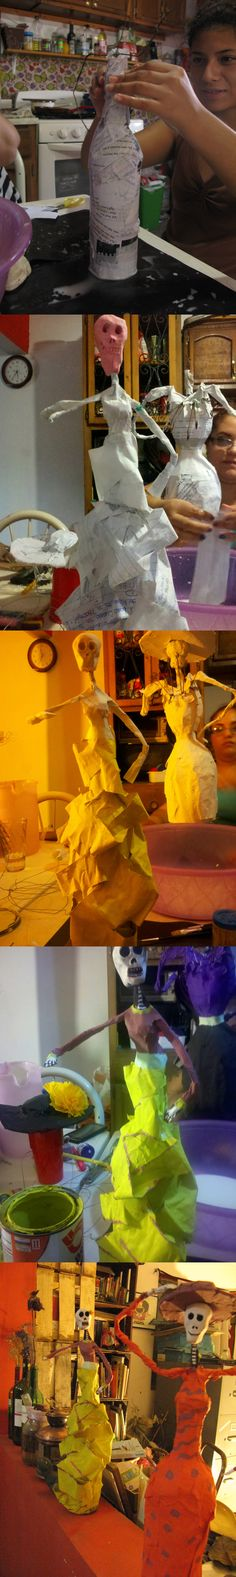 Catrinas de papel maché. Catrinas maché. Hechas sobre una base de botella de vino, corcho, masa modeladora. Usamos pinturas comunes (vinílicas, acuarela)